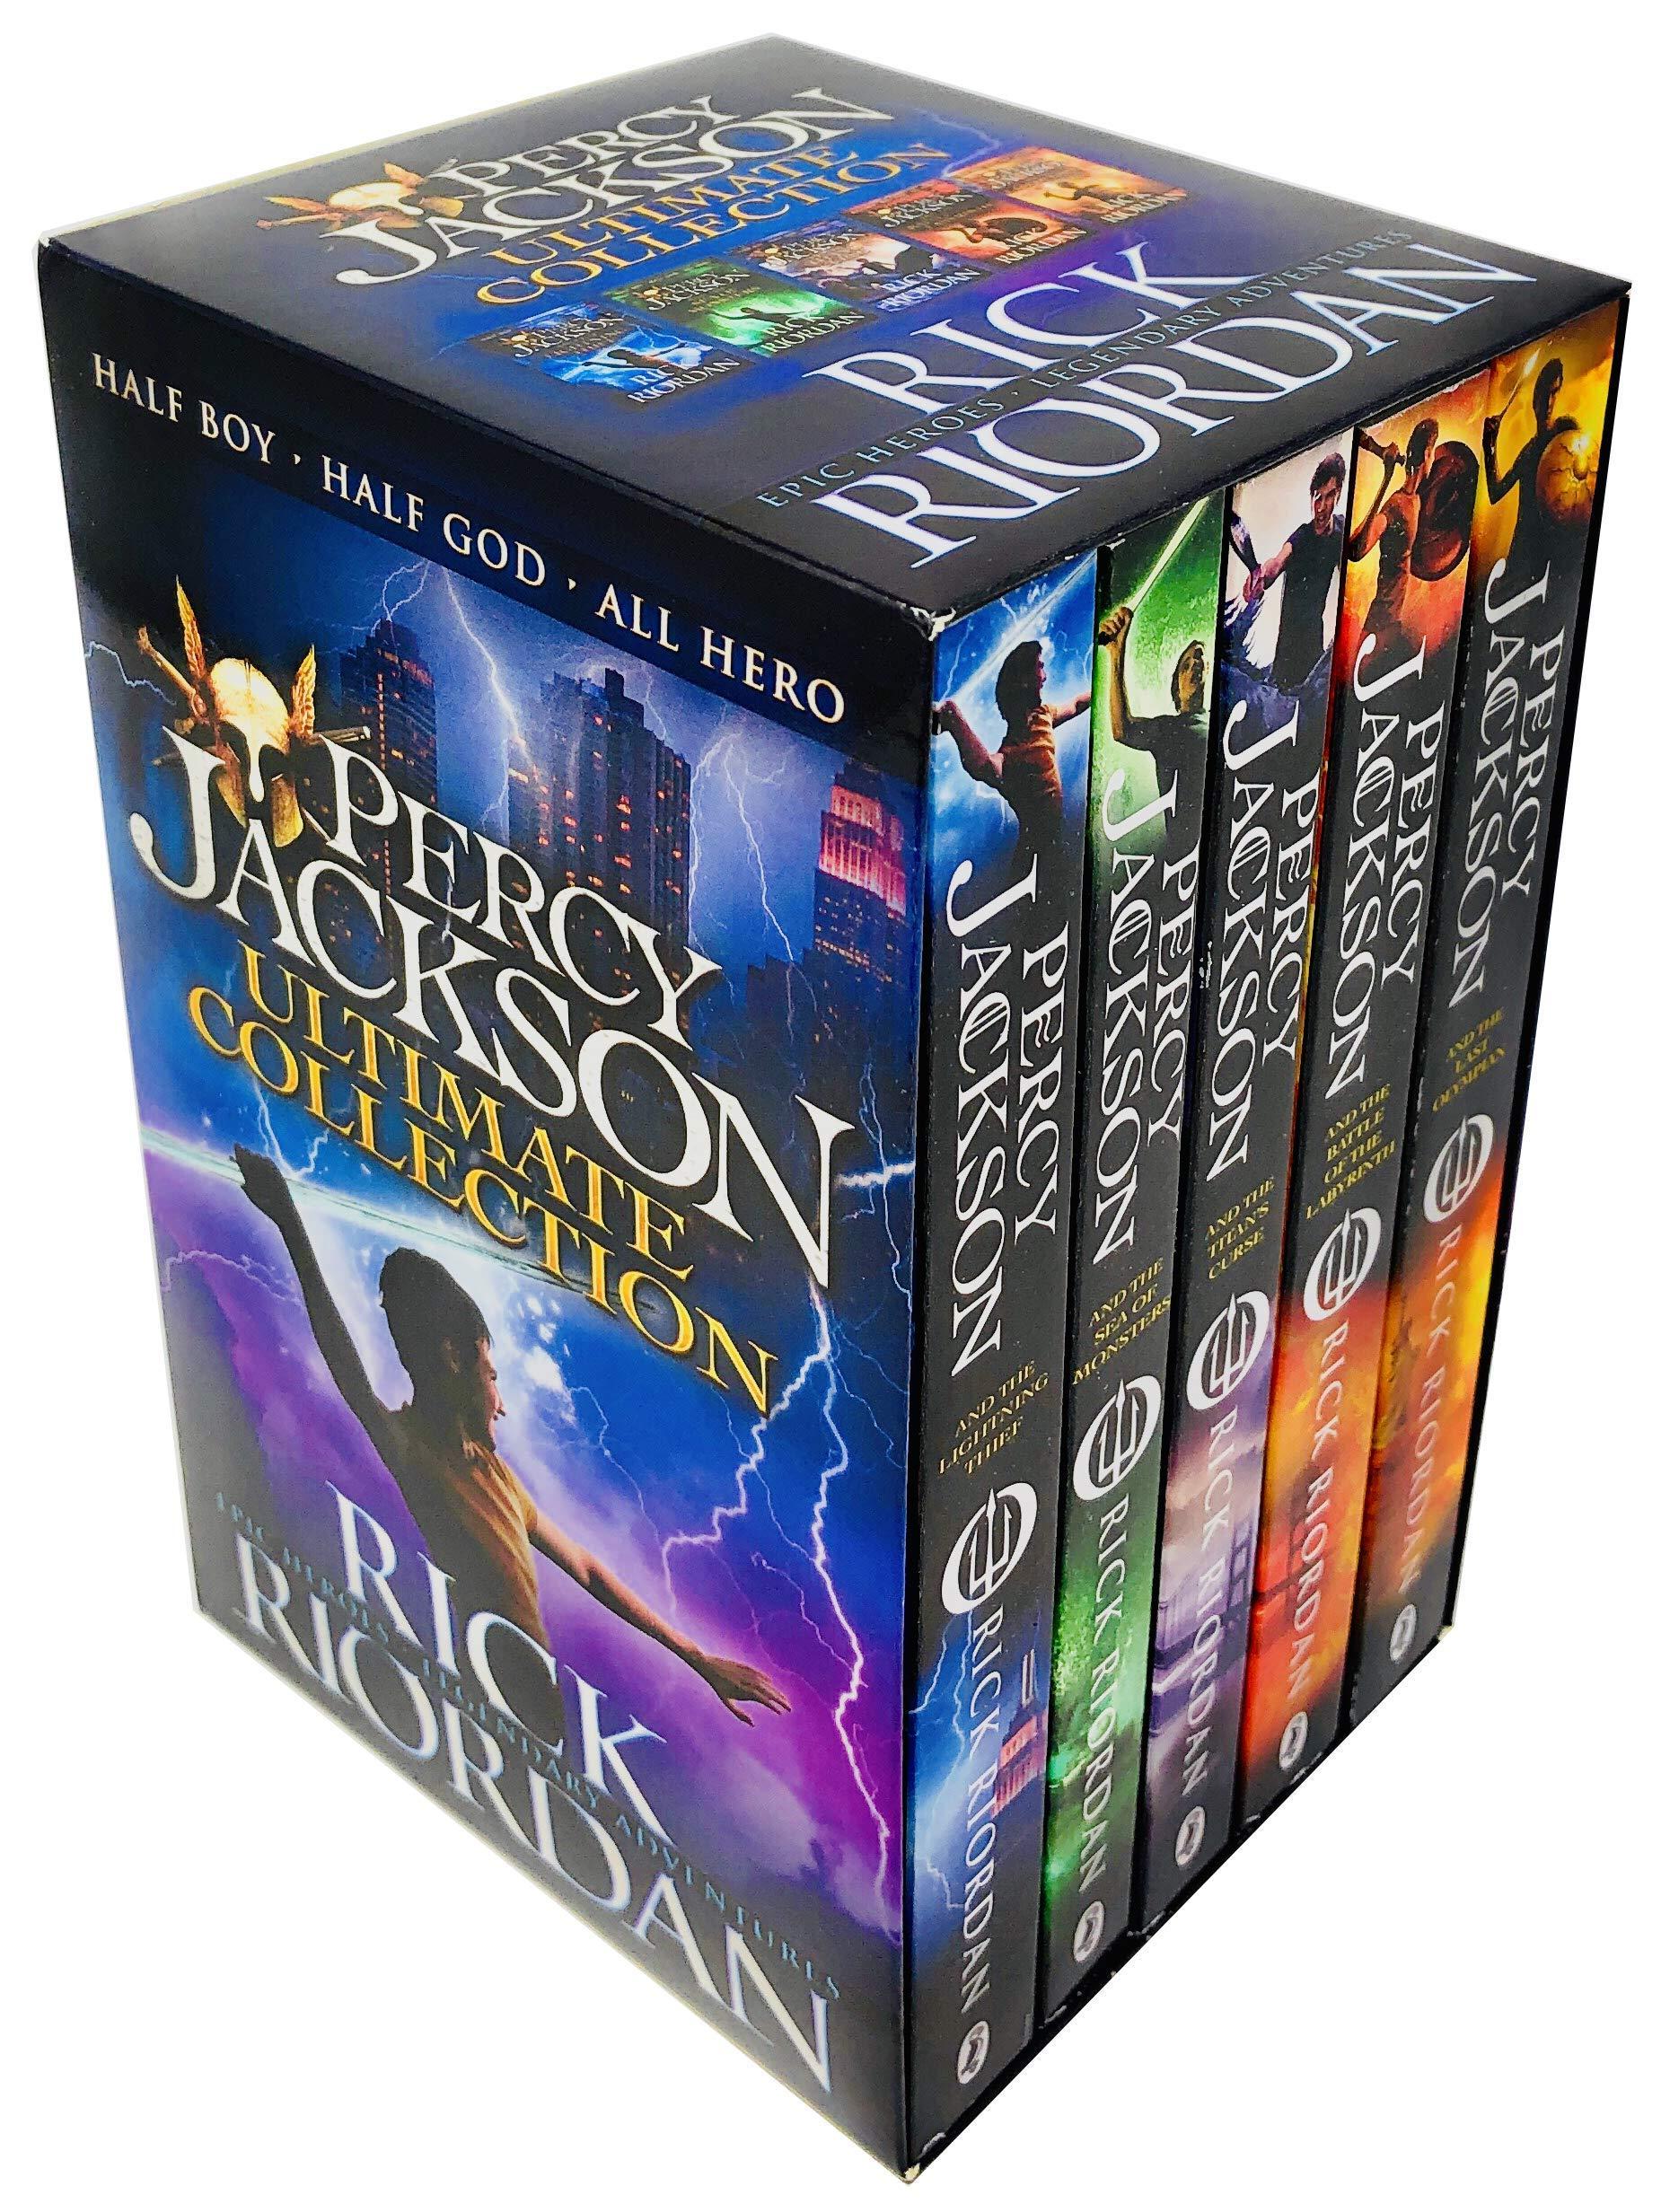 Percy Jackson Pack, 5 books, RRP 34.95 Paperback Jan 01, 2014 Rick Riordan: Amazon.es: Rick Riordan: Libros